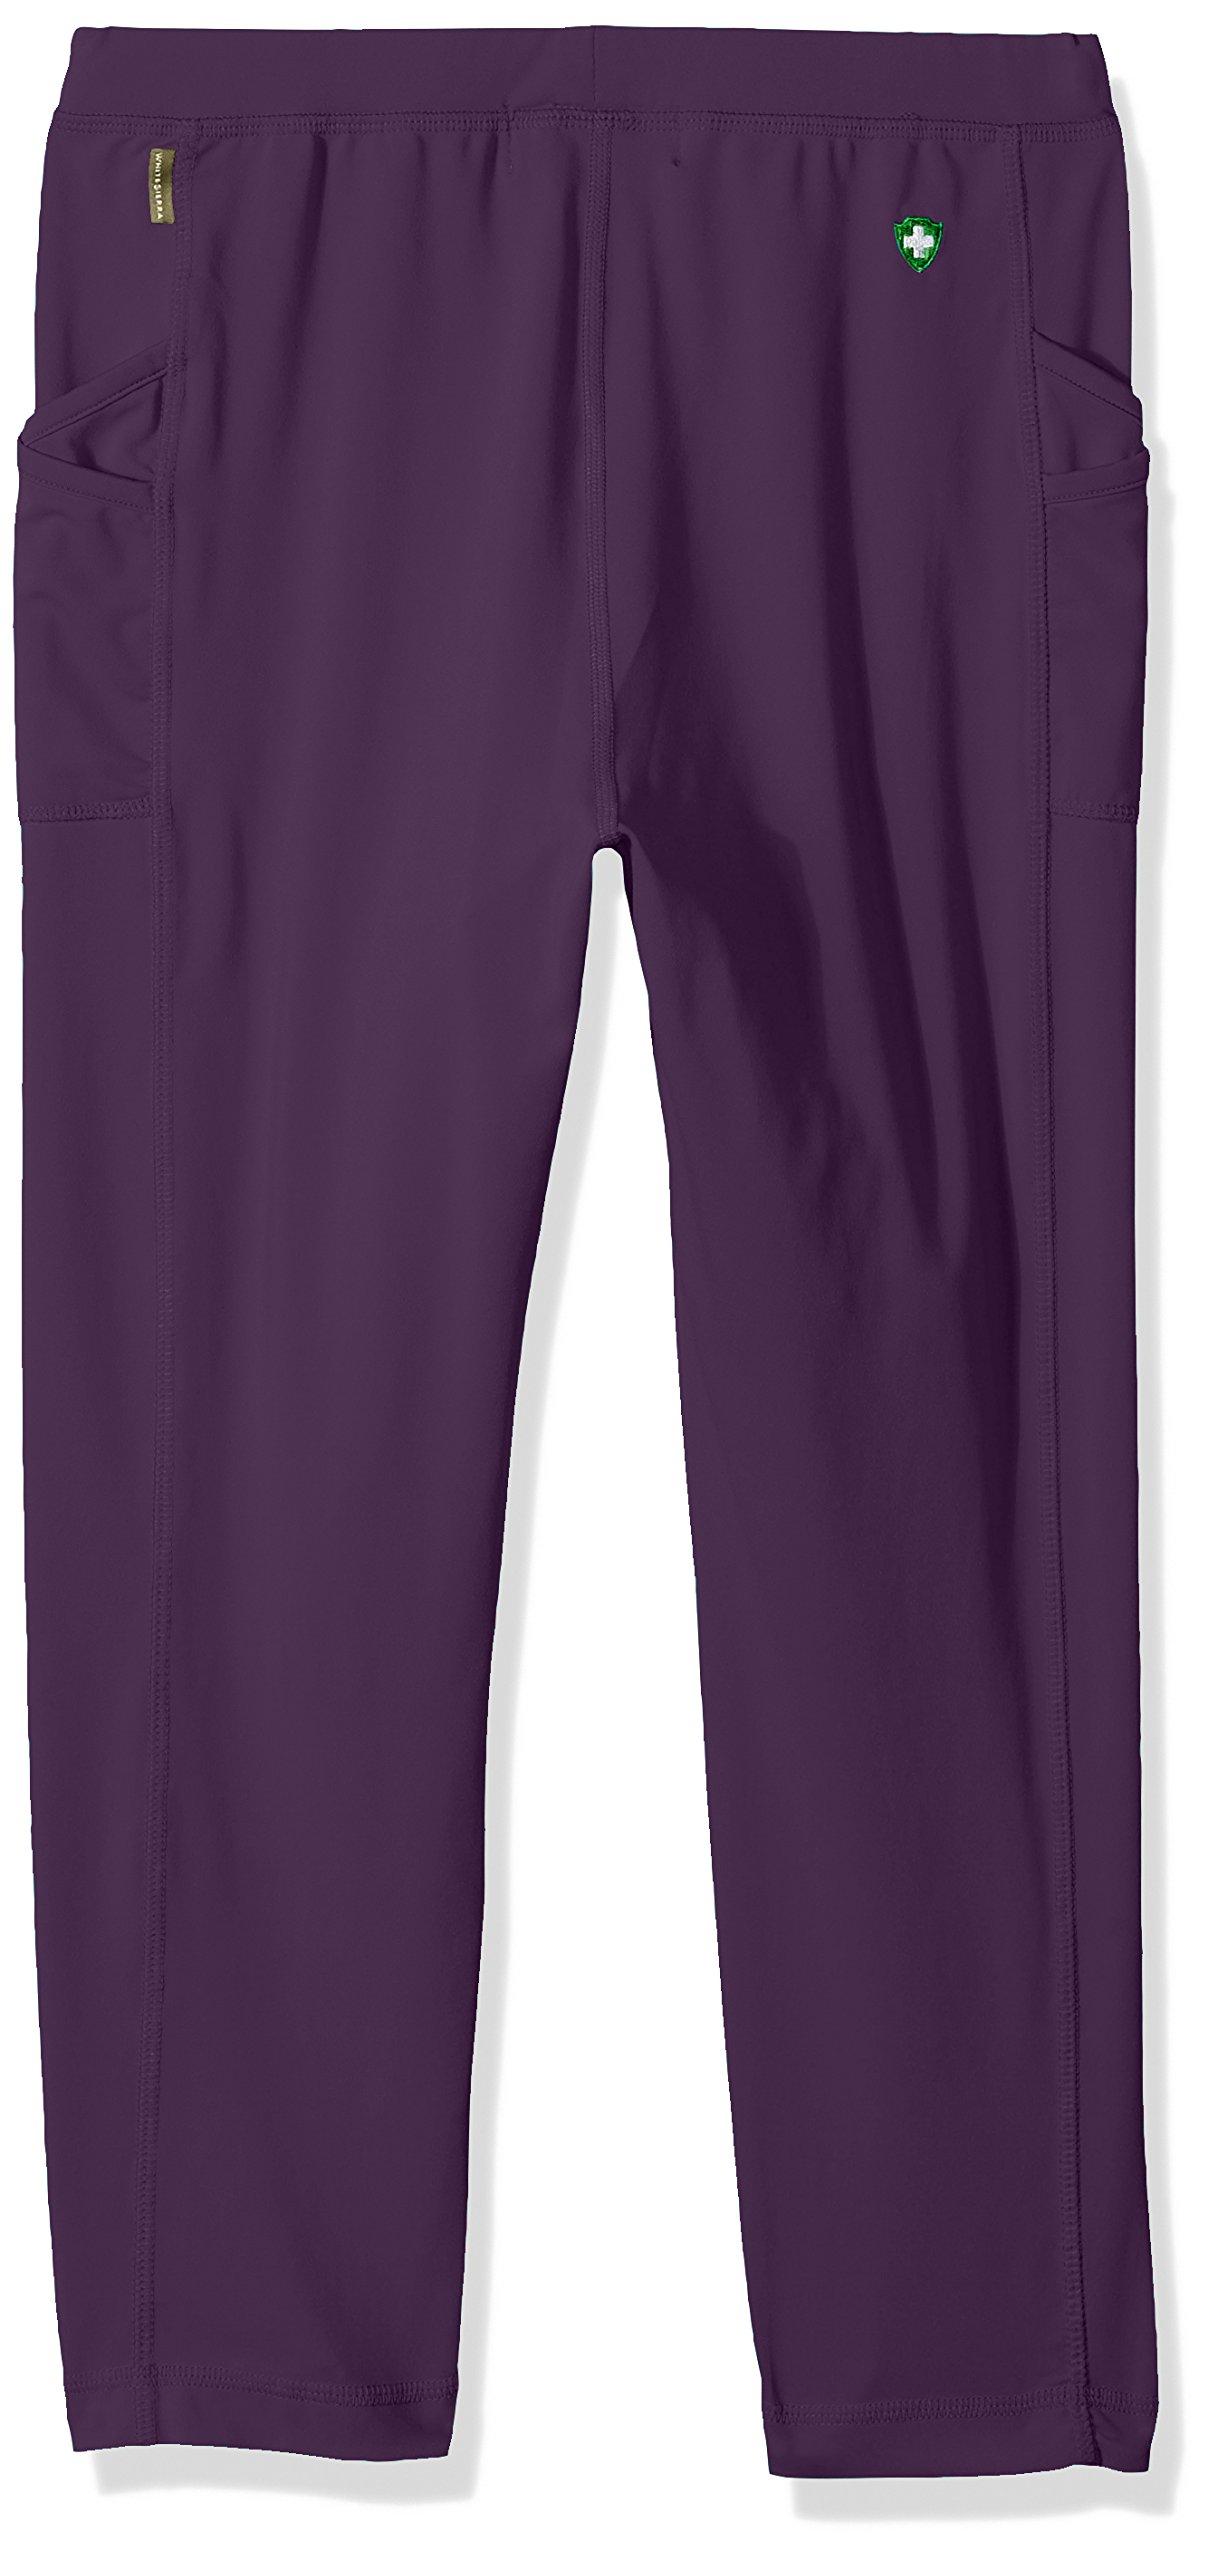 White Sierra Girl's Bug Free Leggings, Shadow Purple, Small by White Sierra (Image #2)